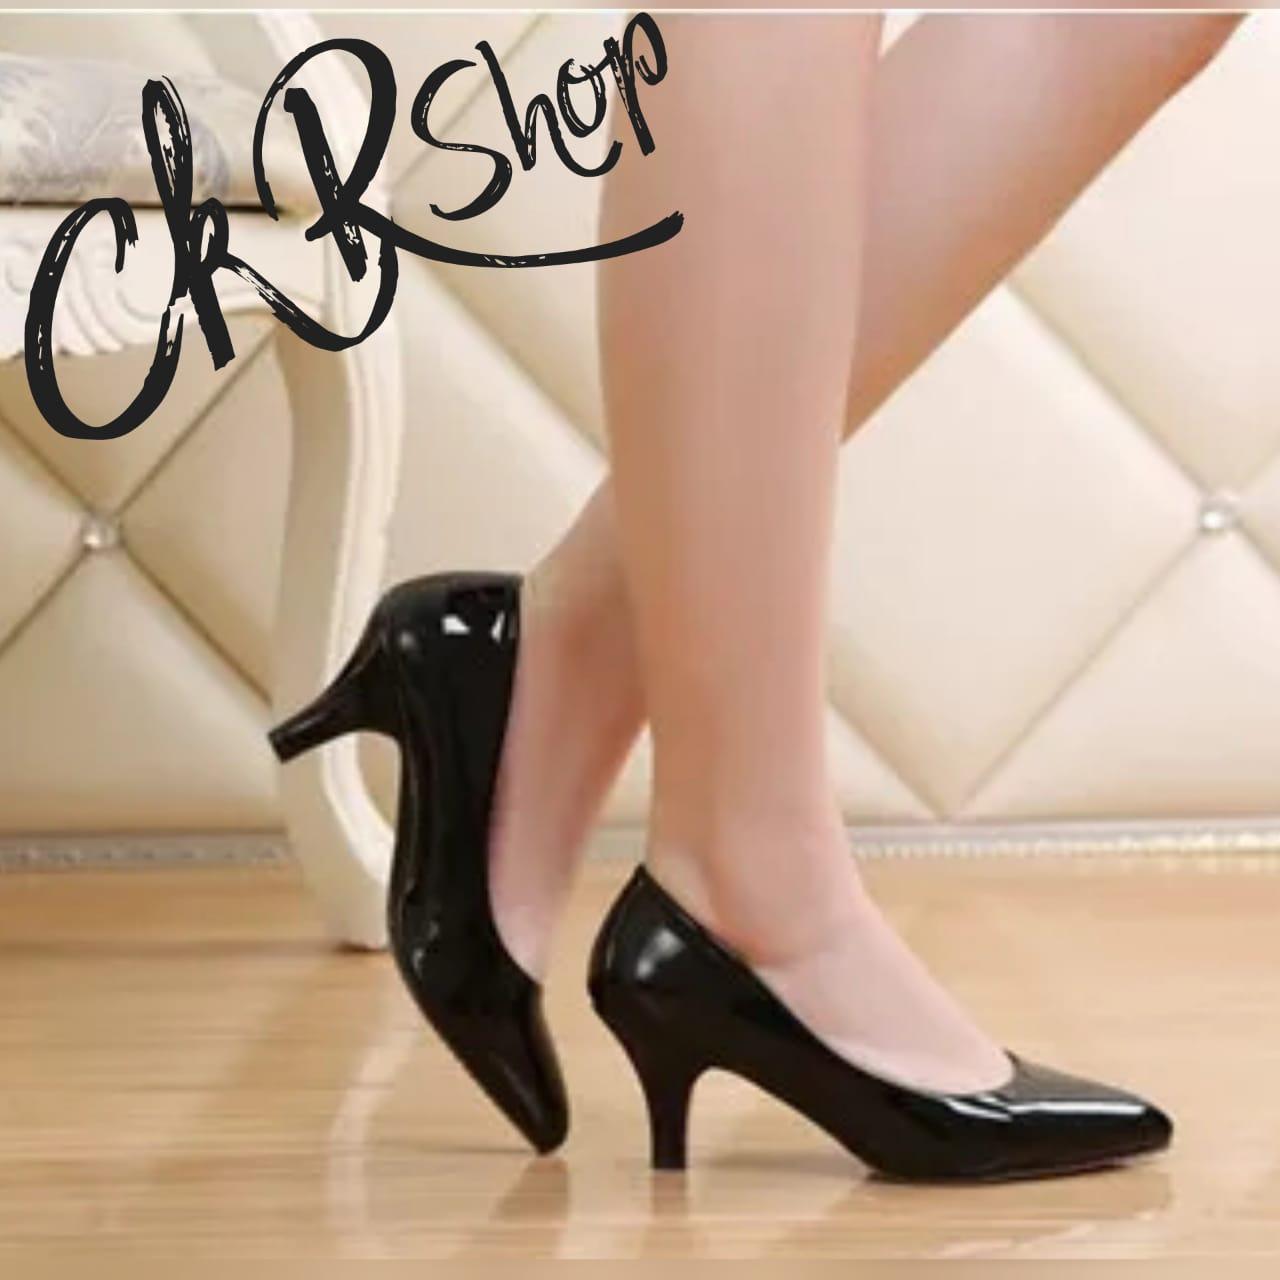 CKR Shop - High Heels Vantoufle Ariana